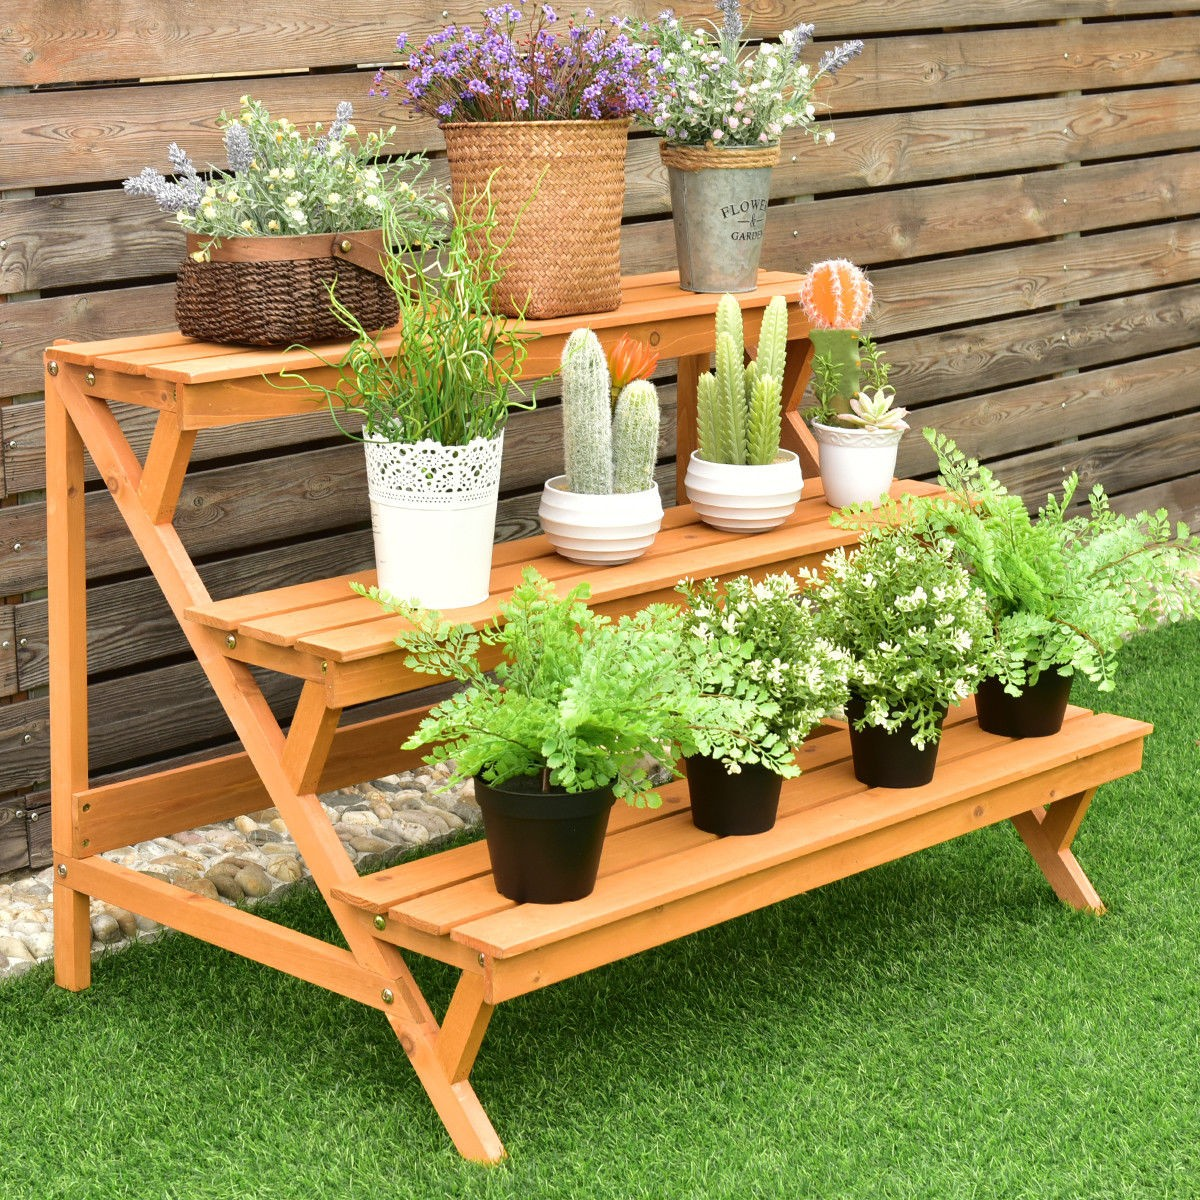 3 tier garden wooden step ladder plant pot rack display for Wooden plant pot ideas